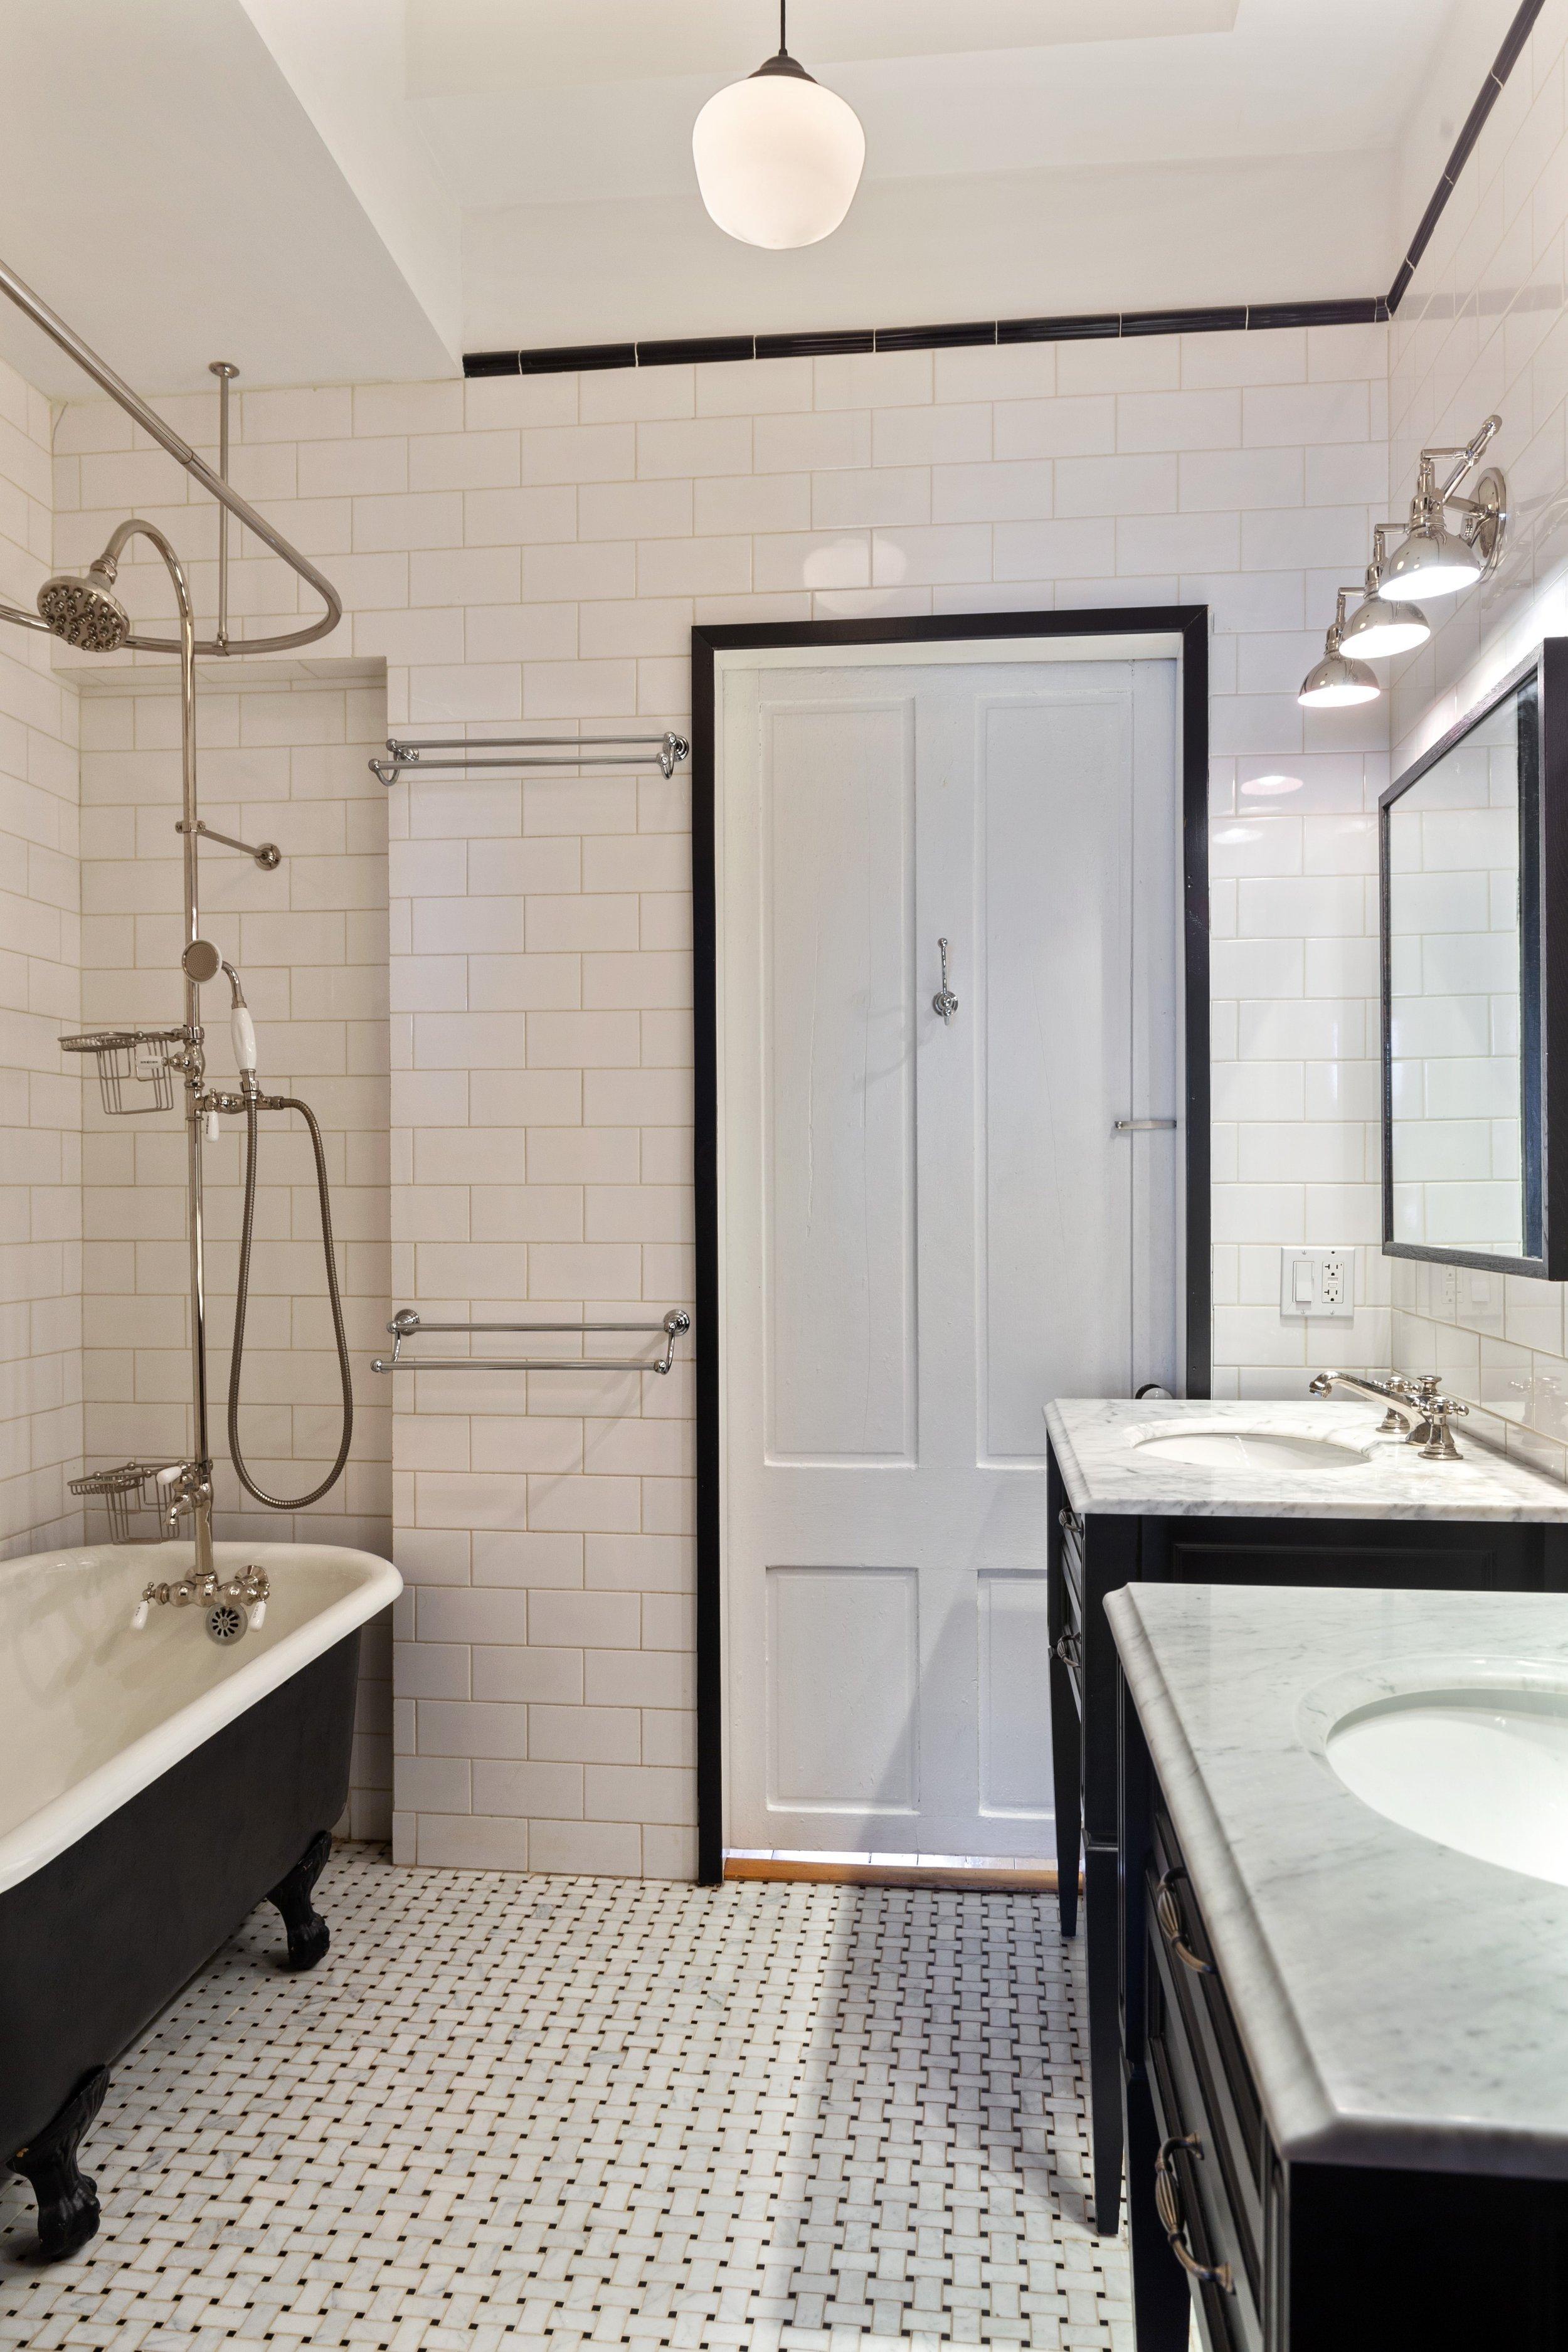 15_151WilloughbyAve_8_Bathroom_HiRes.jpg